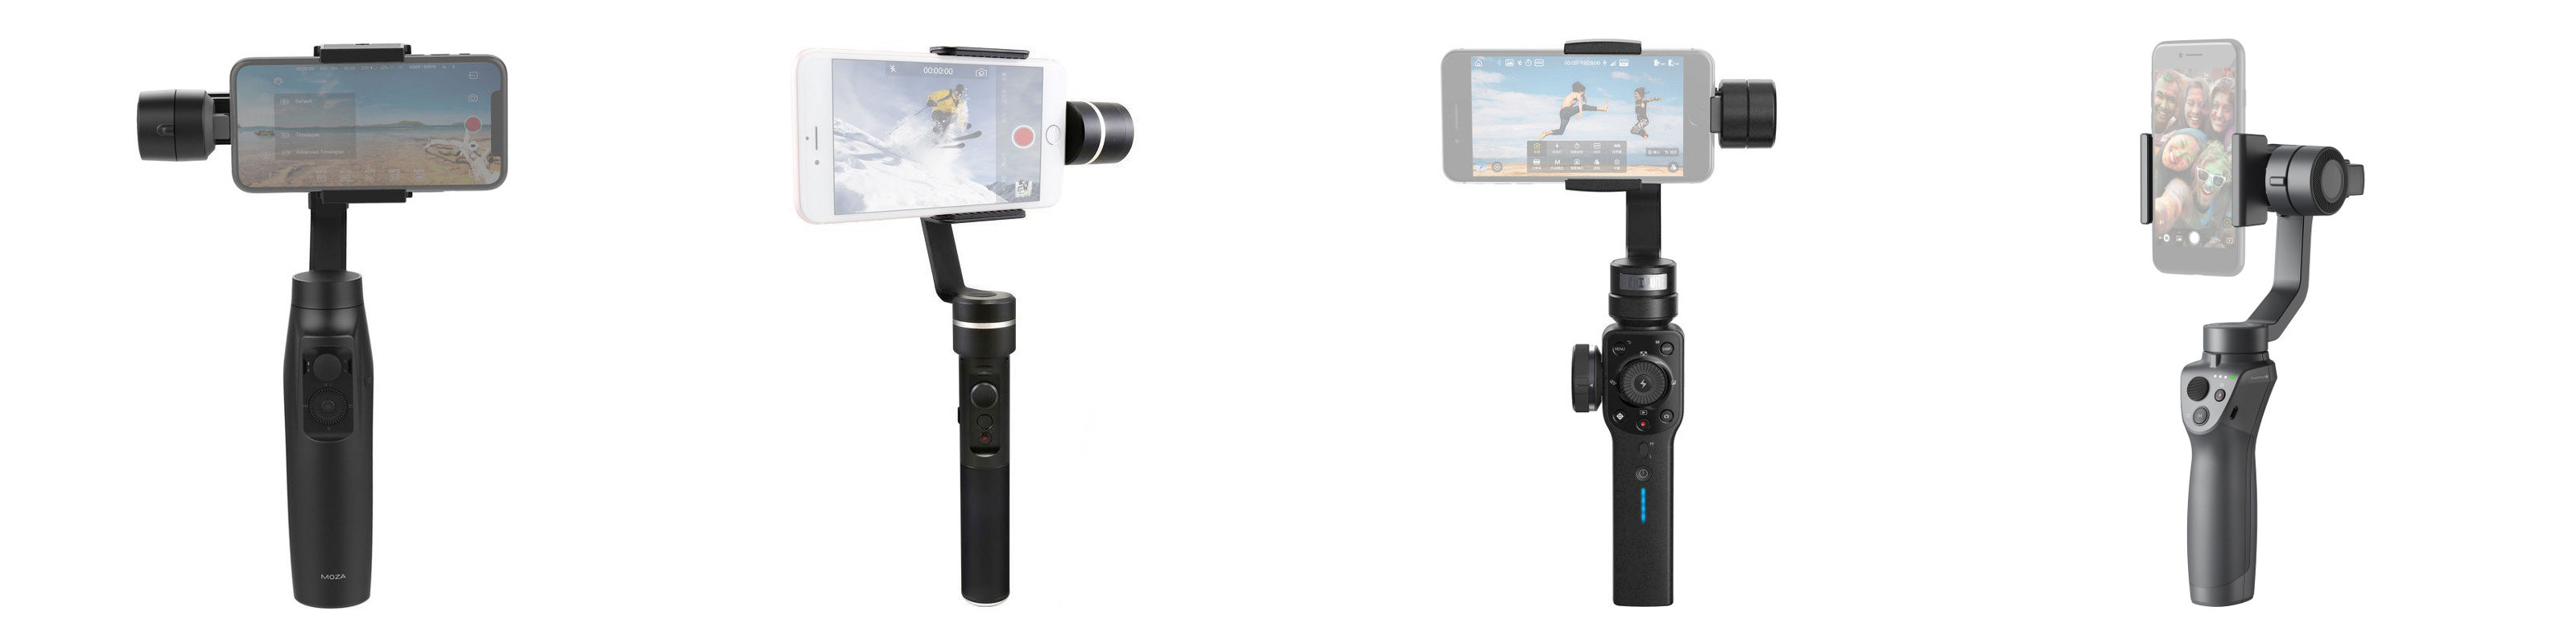 Wat zijn de verschillen tussen de Moza Mini MI, DJI Osmo Mobile 2, Feiyu Tech SPG, en de Zhiyun Smooth 4?